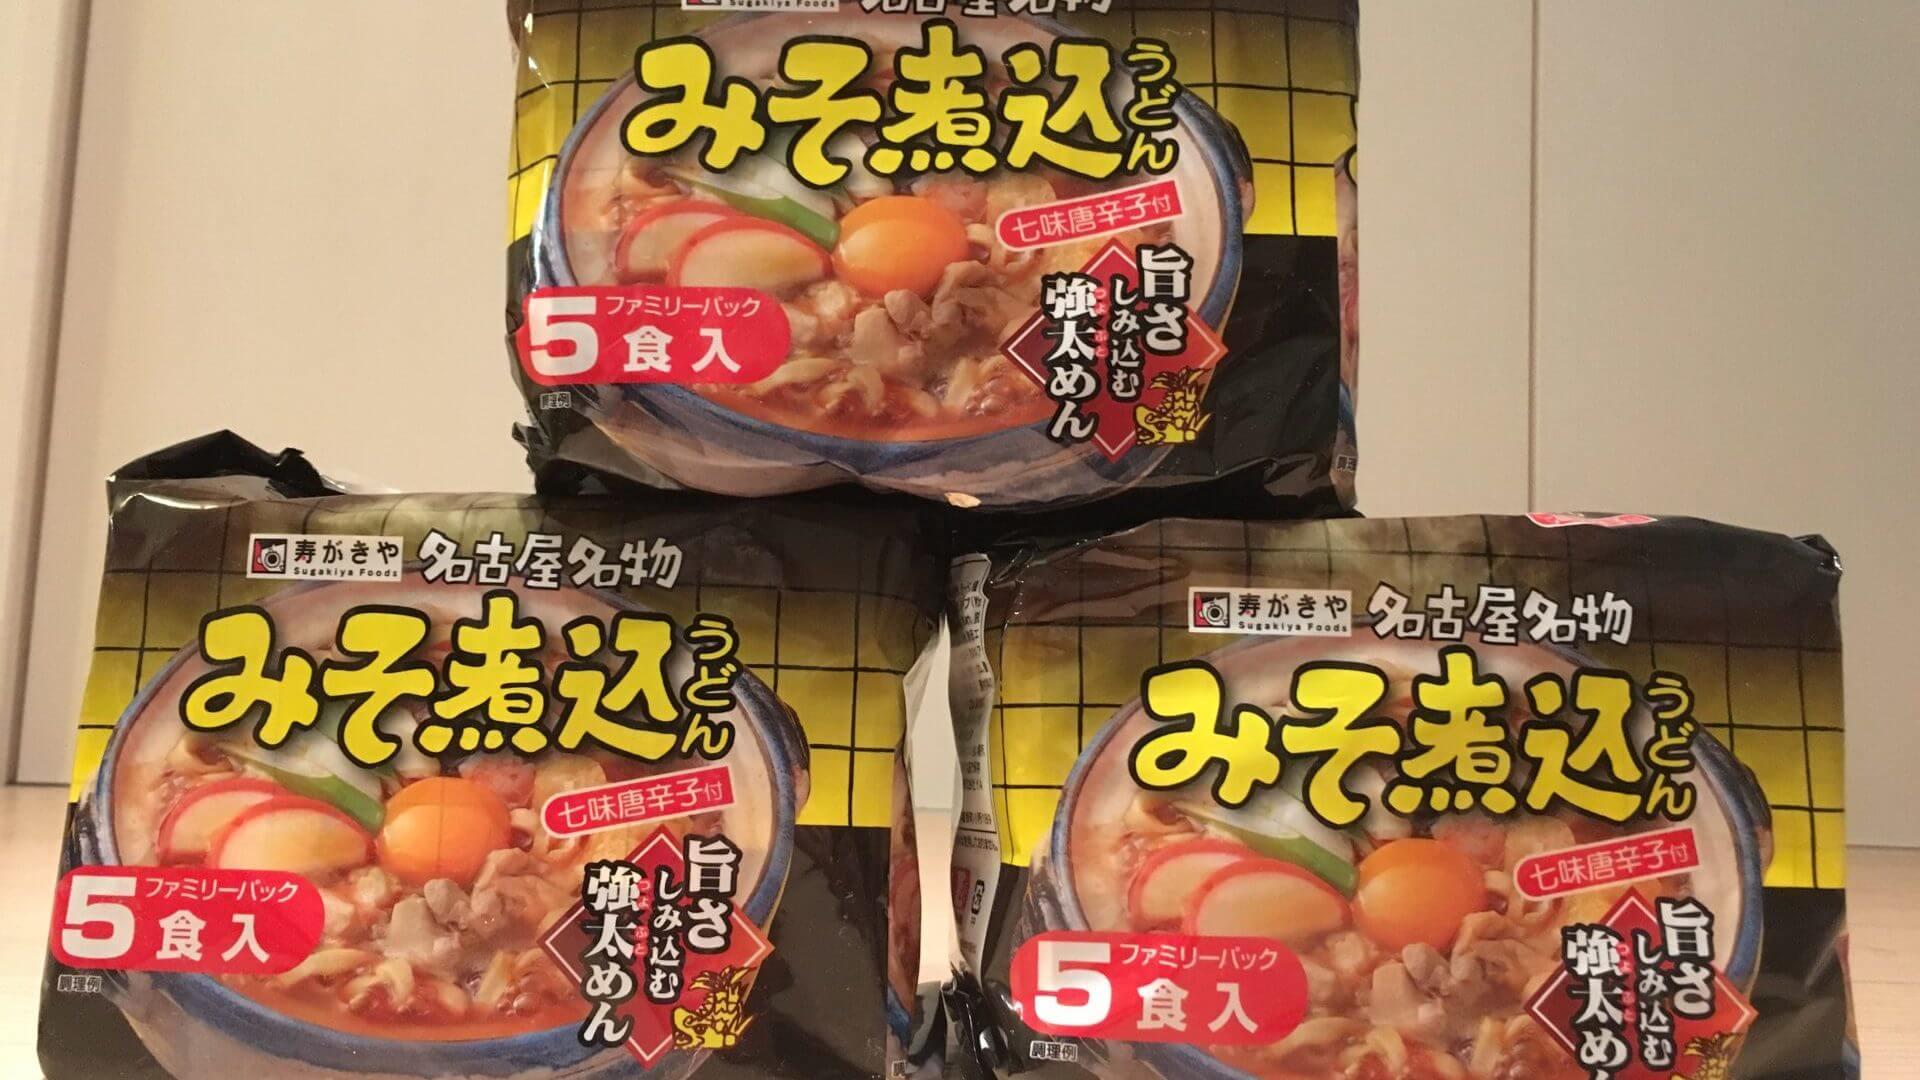 Misonikomi udon Sugakiya